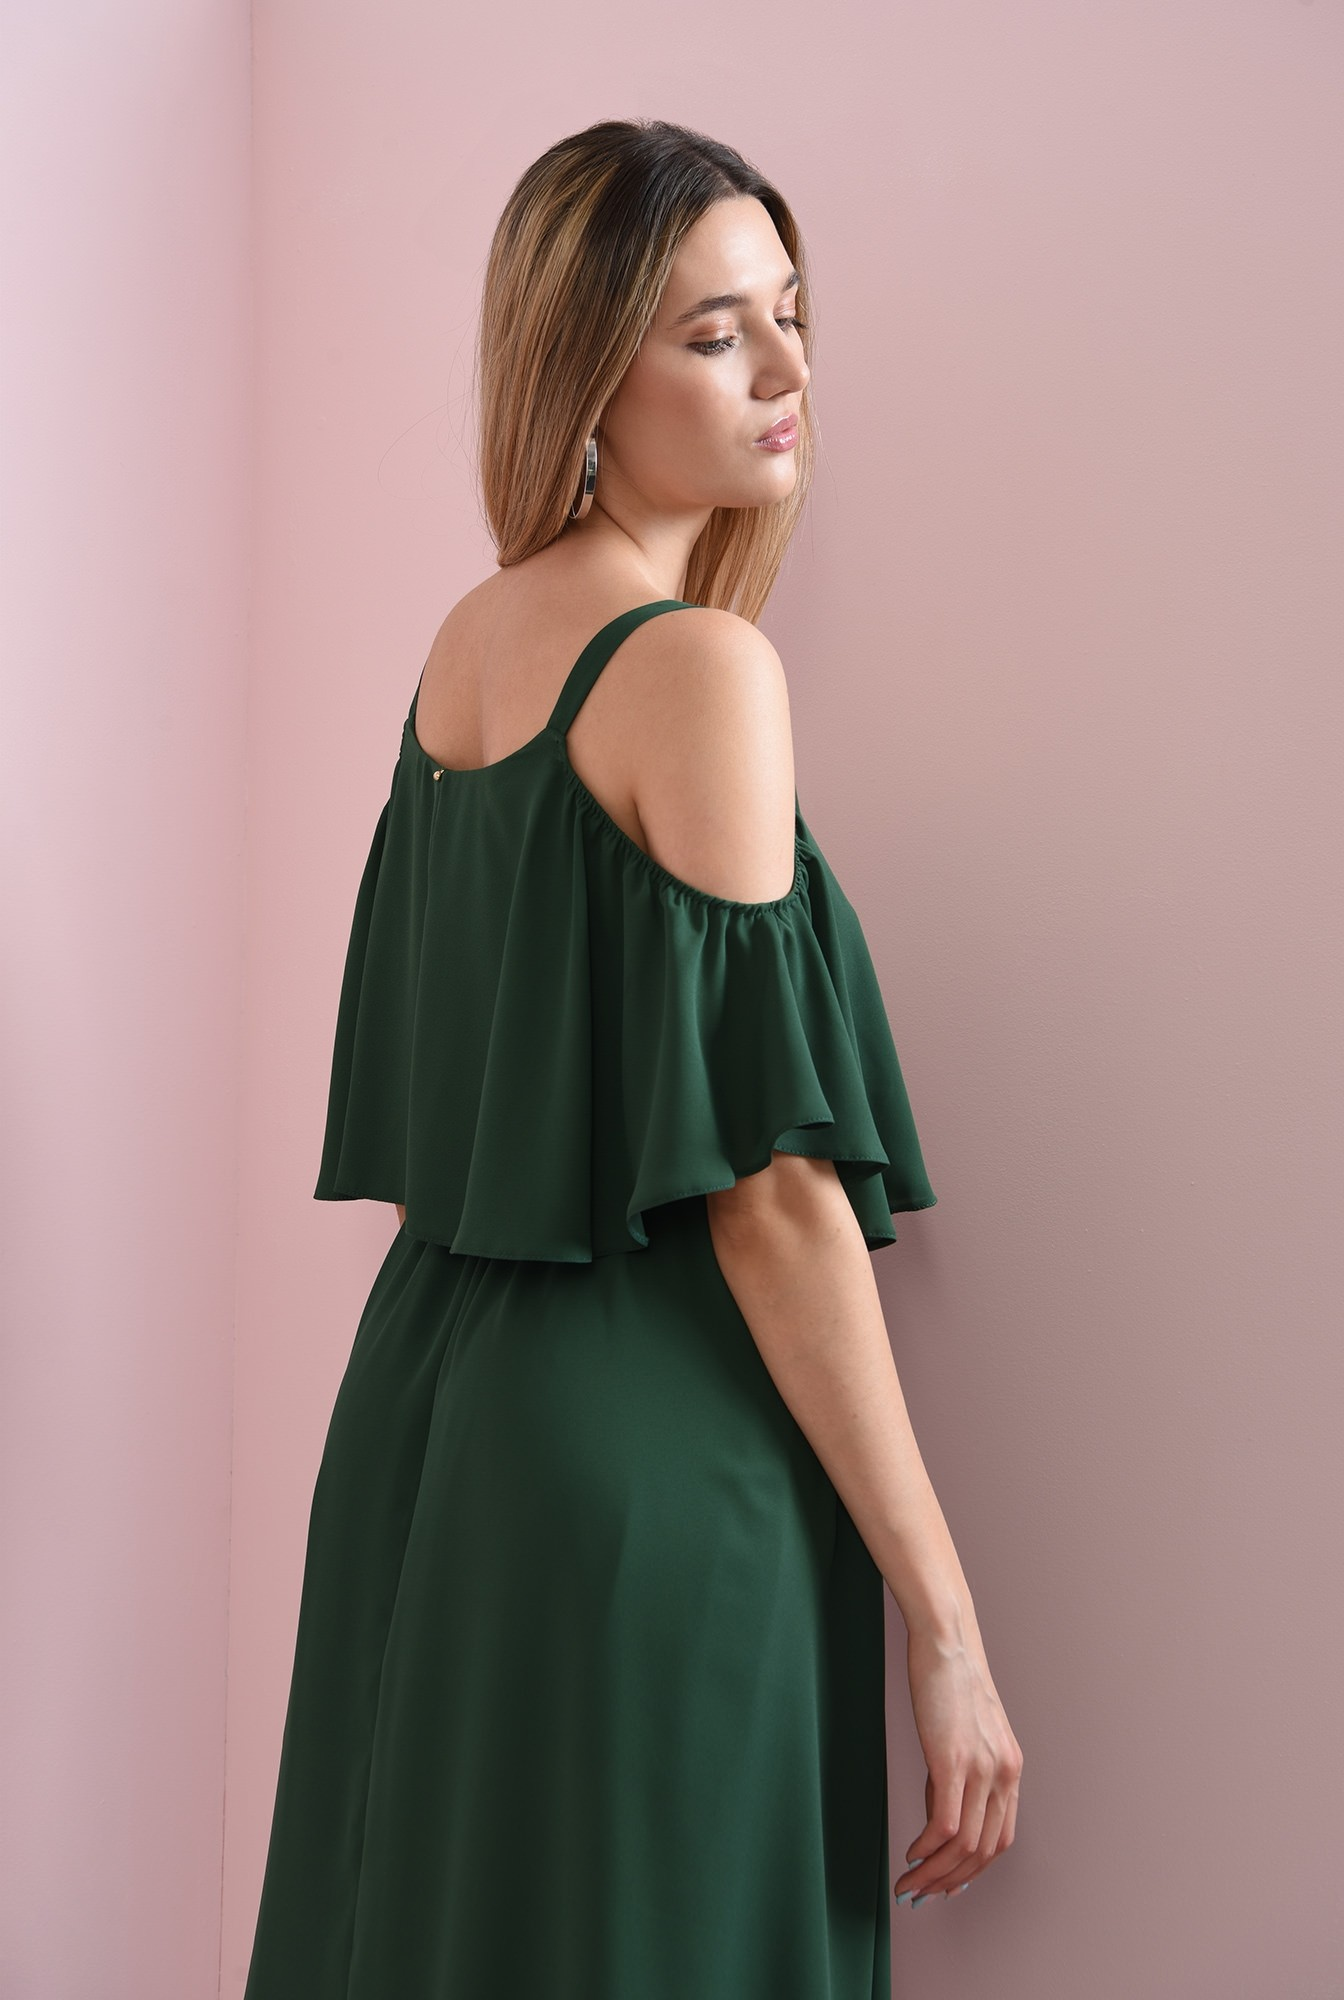 2 - rochie casual, verde, evazata